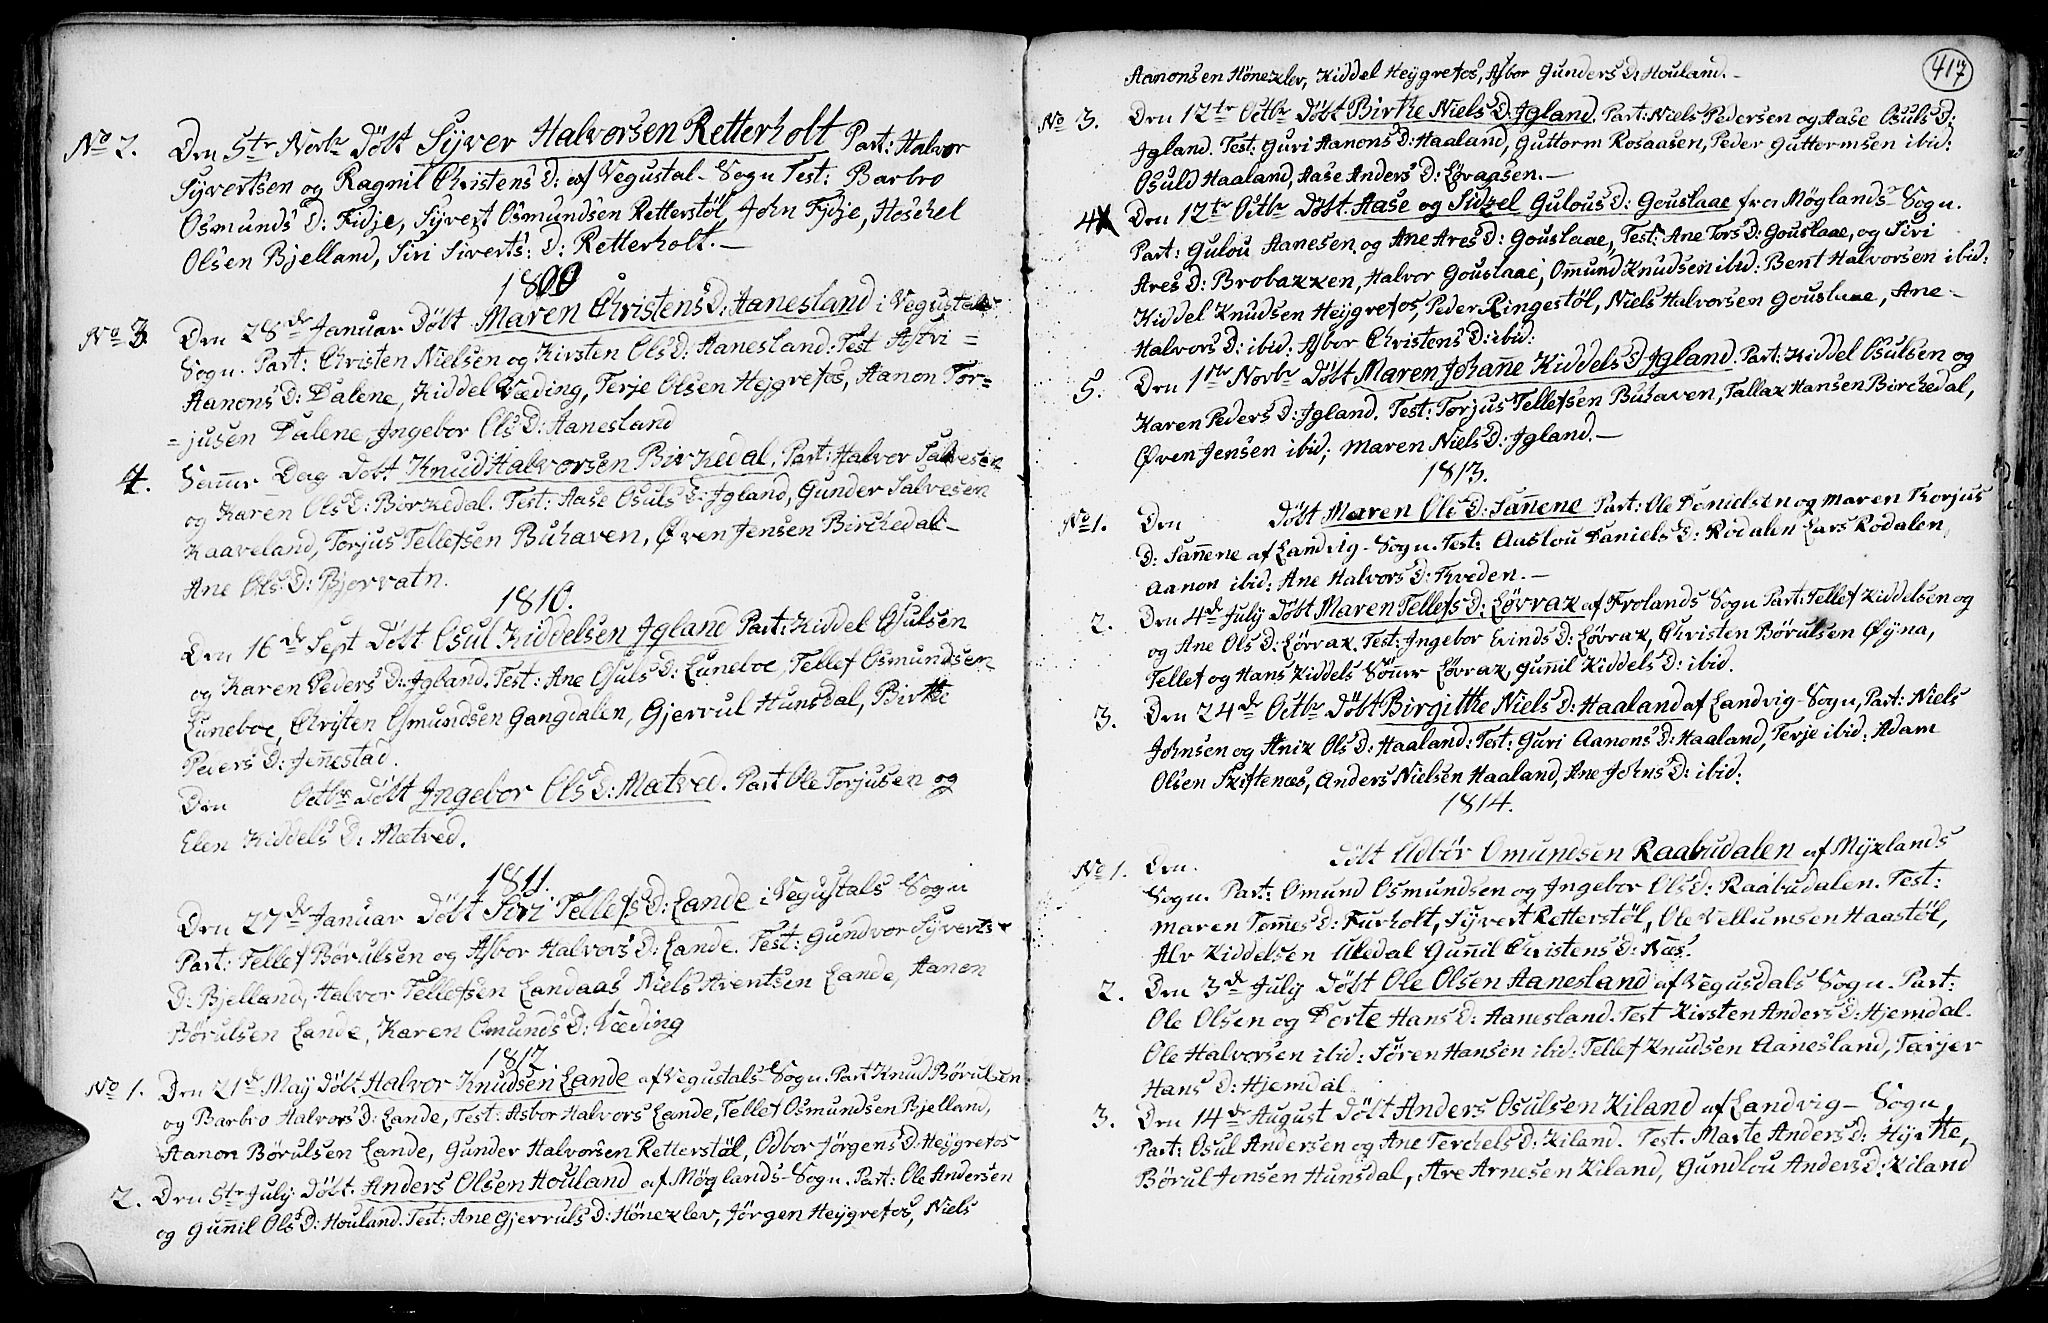 SAK, Hommedal sokneprestkontor, F/Fa/Fab/L0002: Ministerialbok nr. A 2 /3, 1740-1821, s. 417